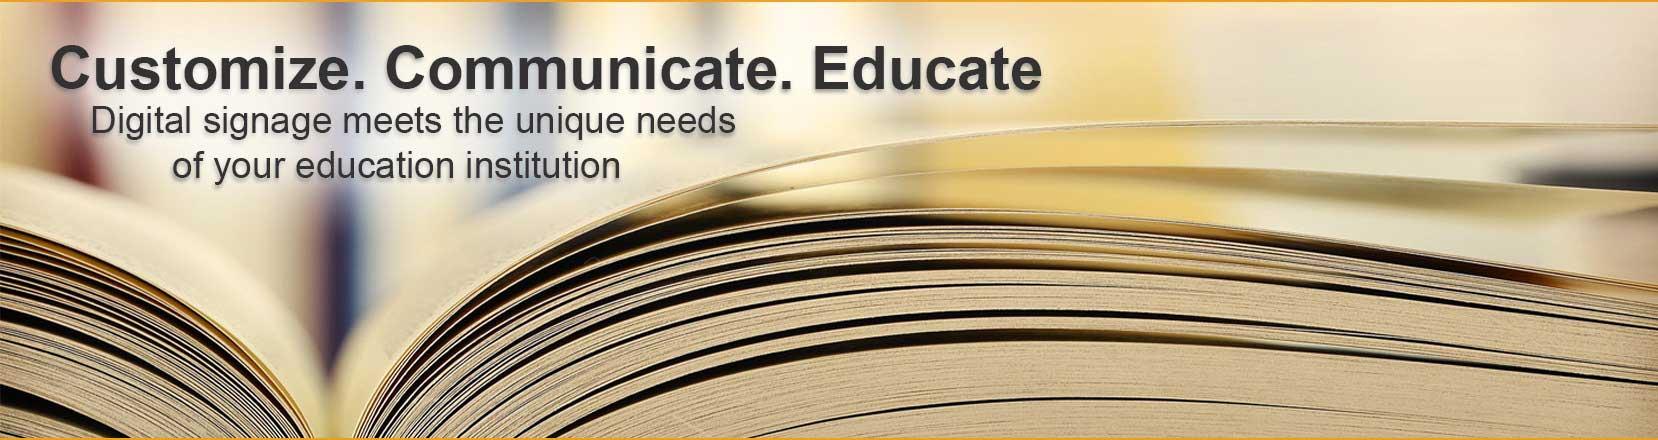 digital signage for education software